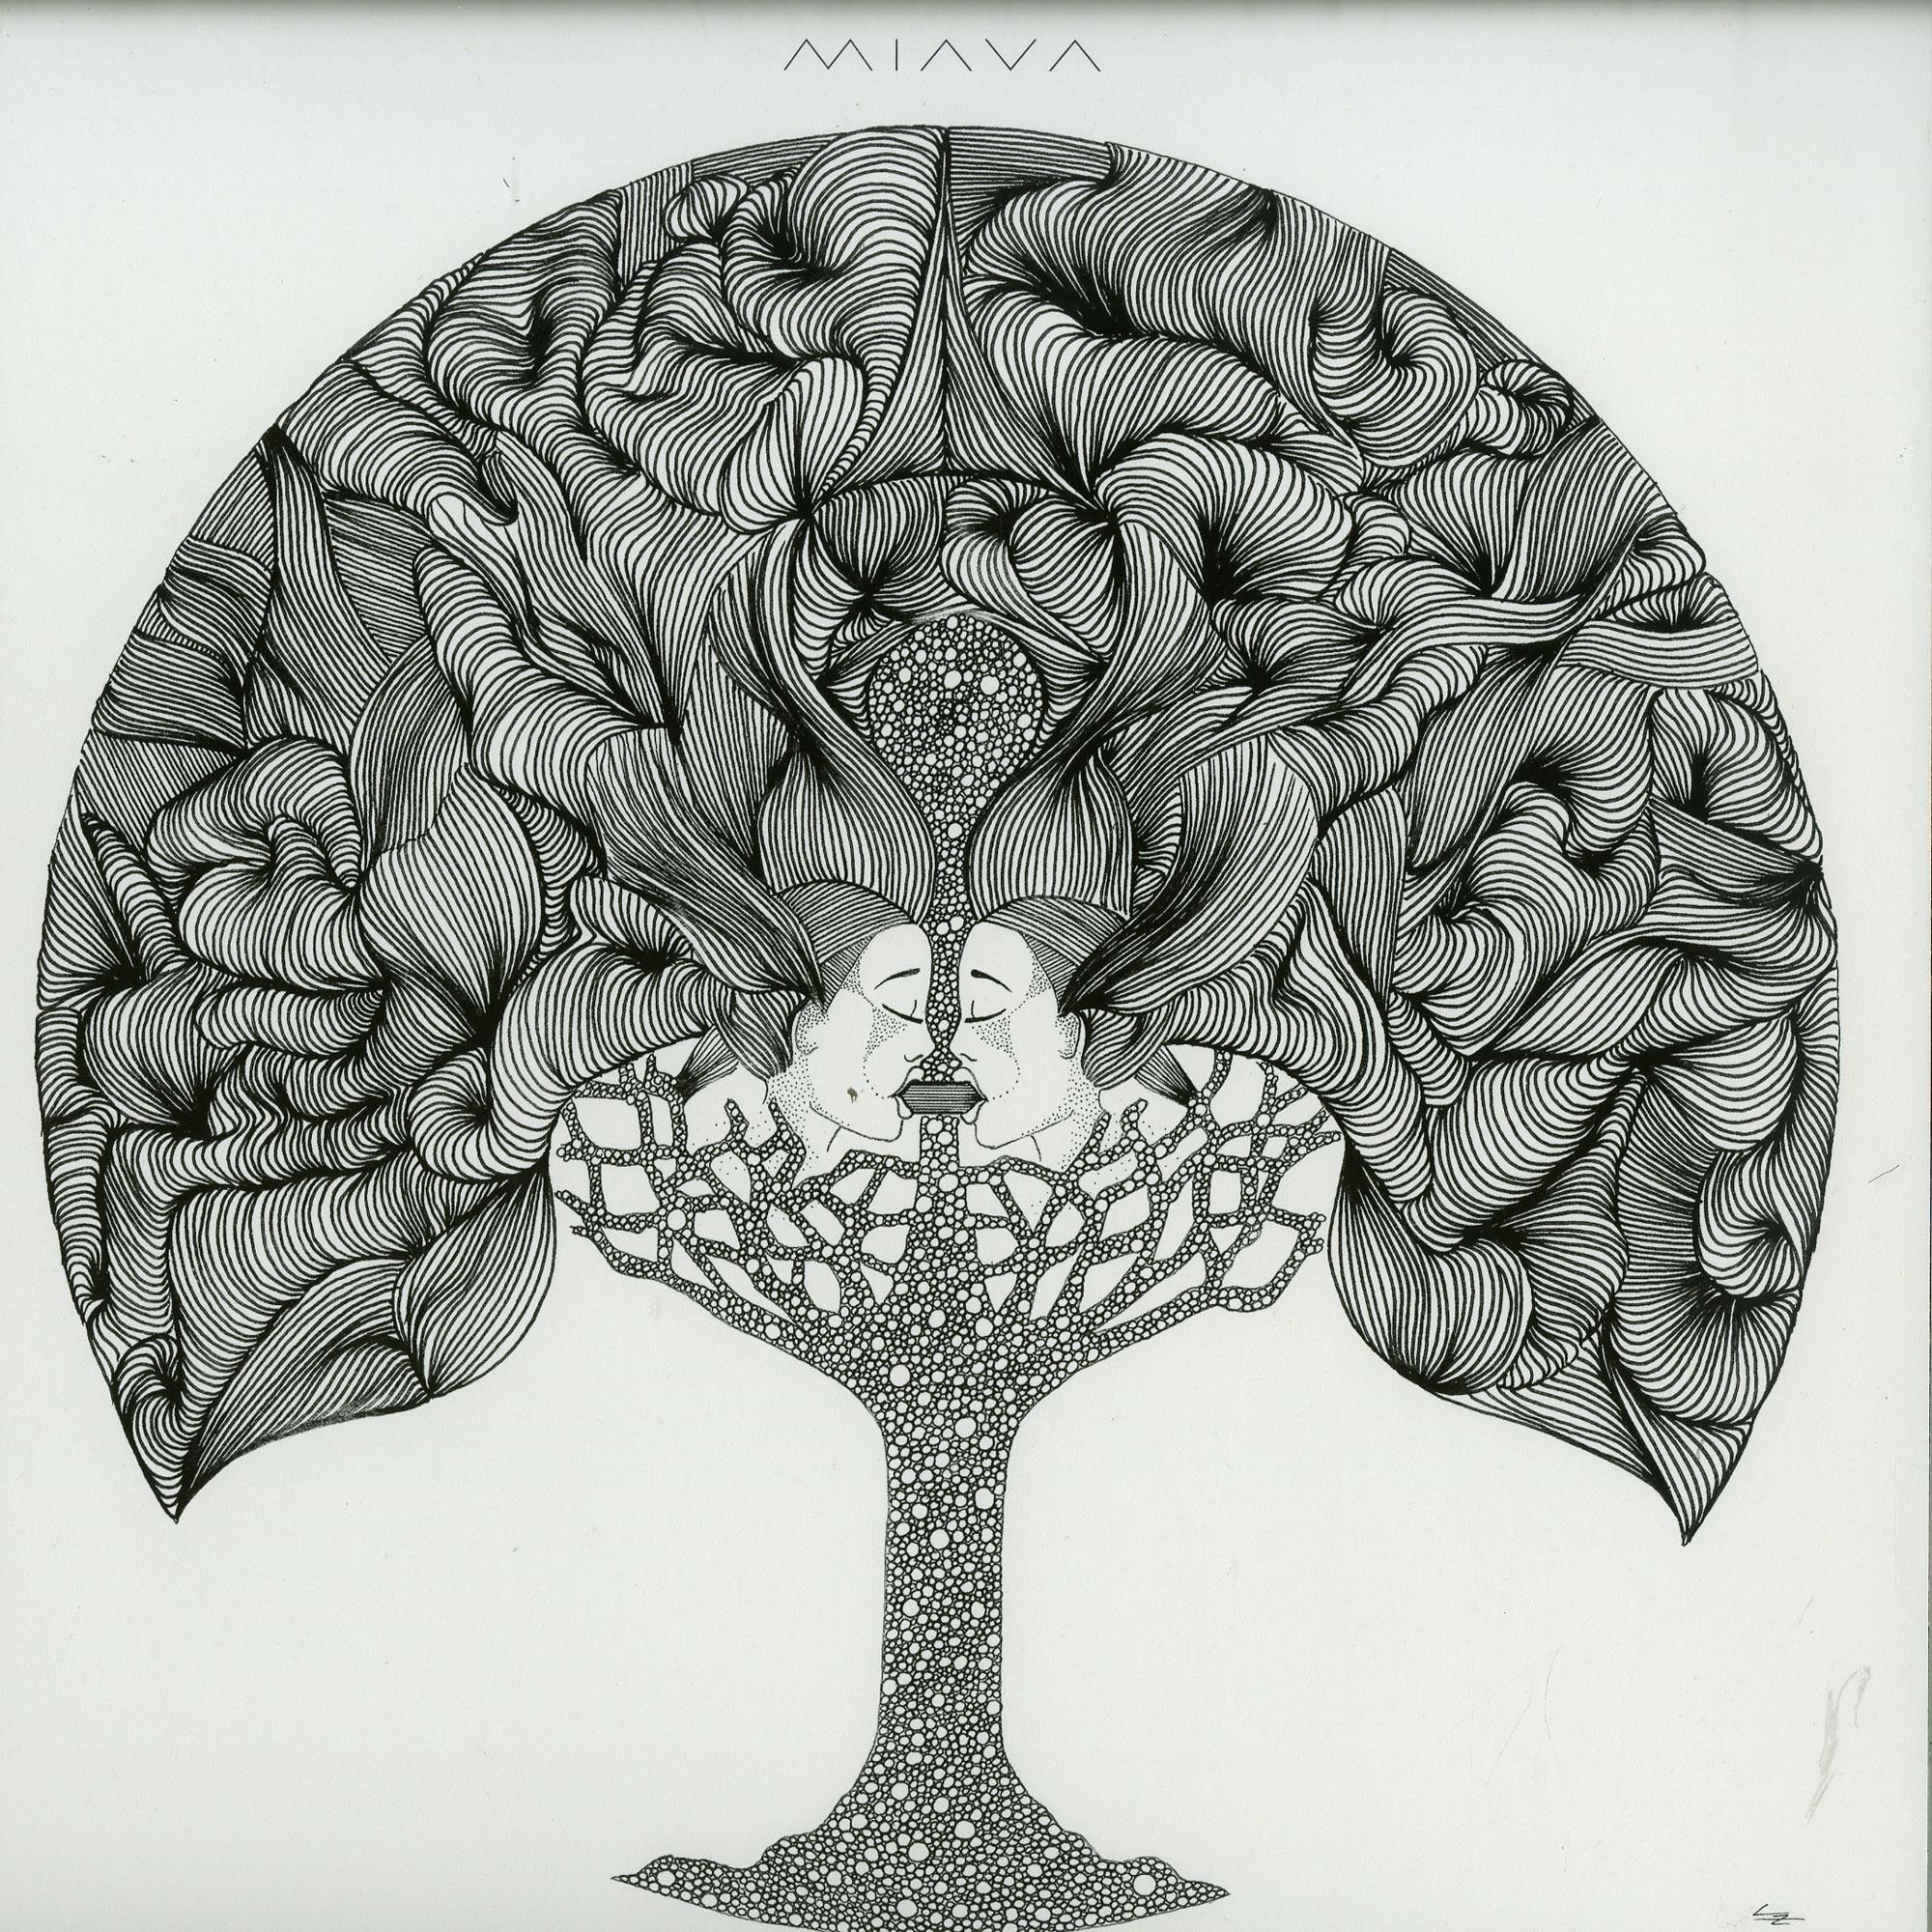 Axpin - GILGAMESH EP / INCL CHRISTIAN BURKHARDT RMX